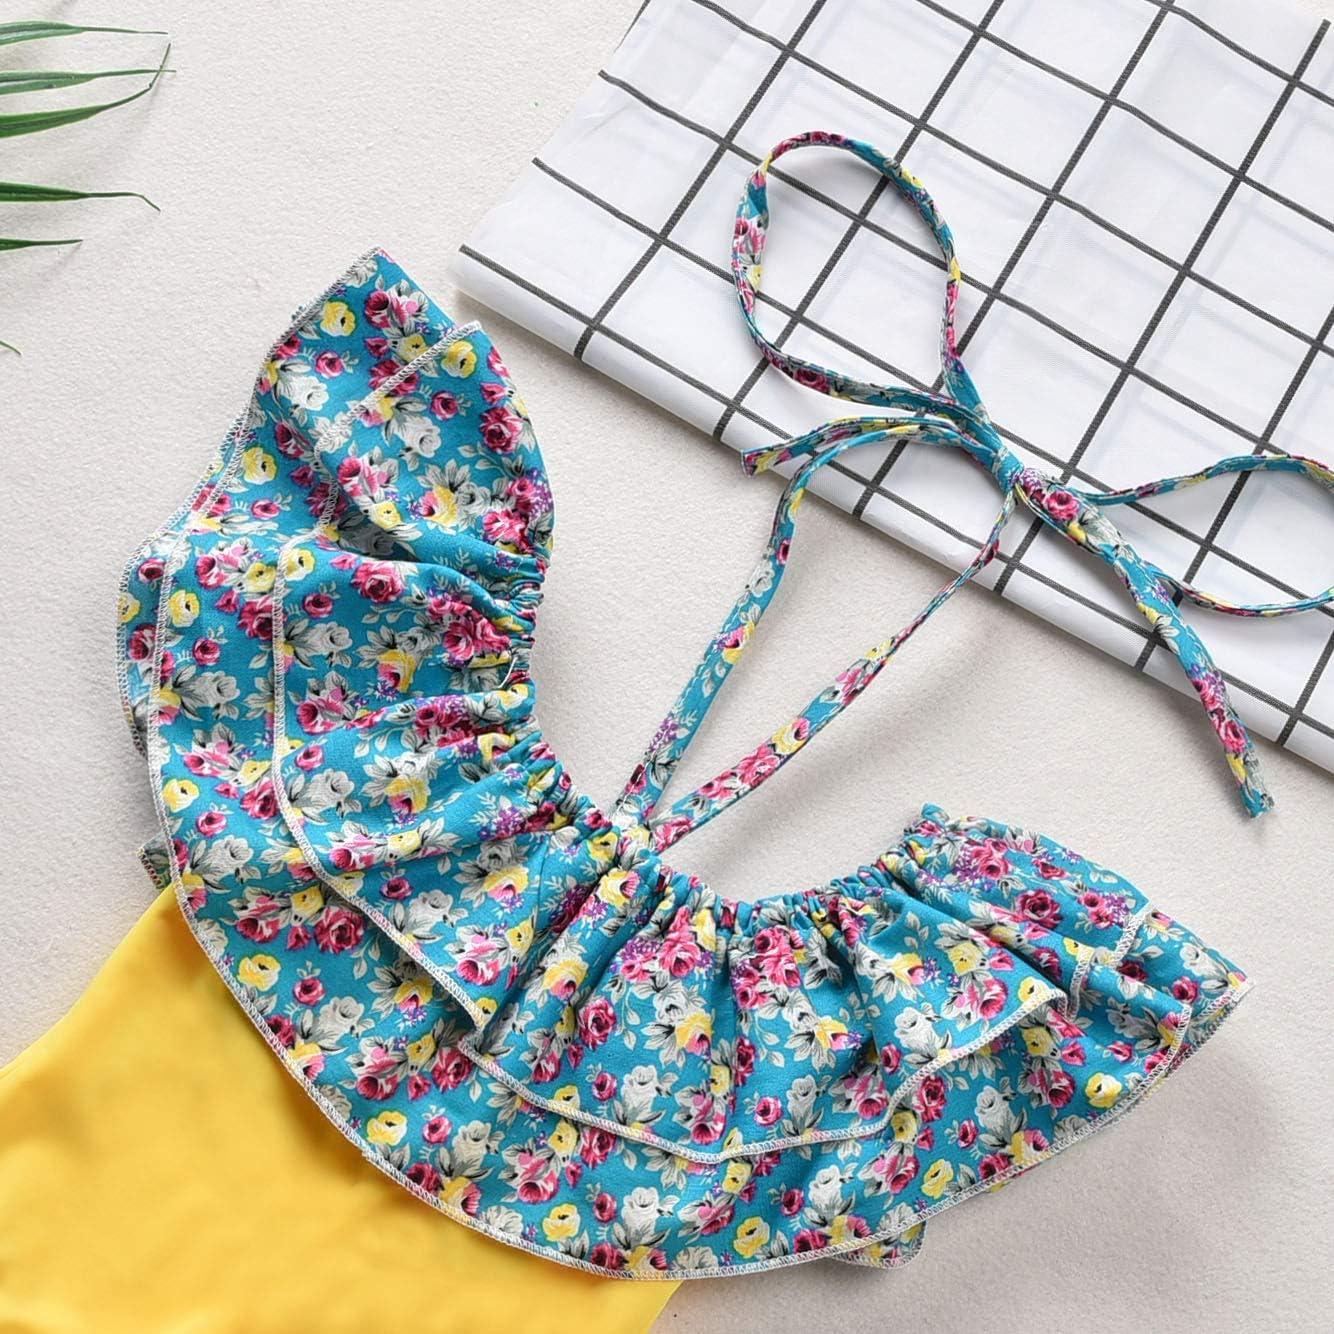 Girls Ruffle Off Shoulder One Piece Swimsuit Hawaiian Beach Sport Banded Bathing Suit Set Swimwear for 6M-10T